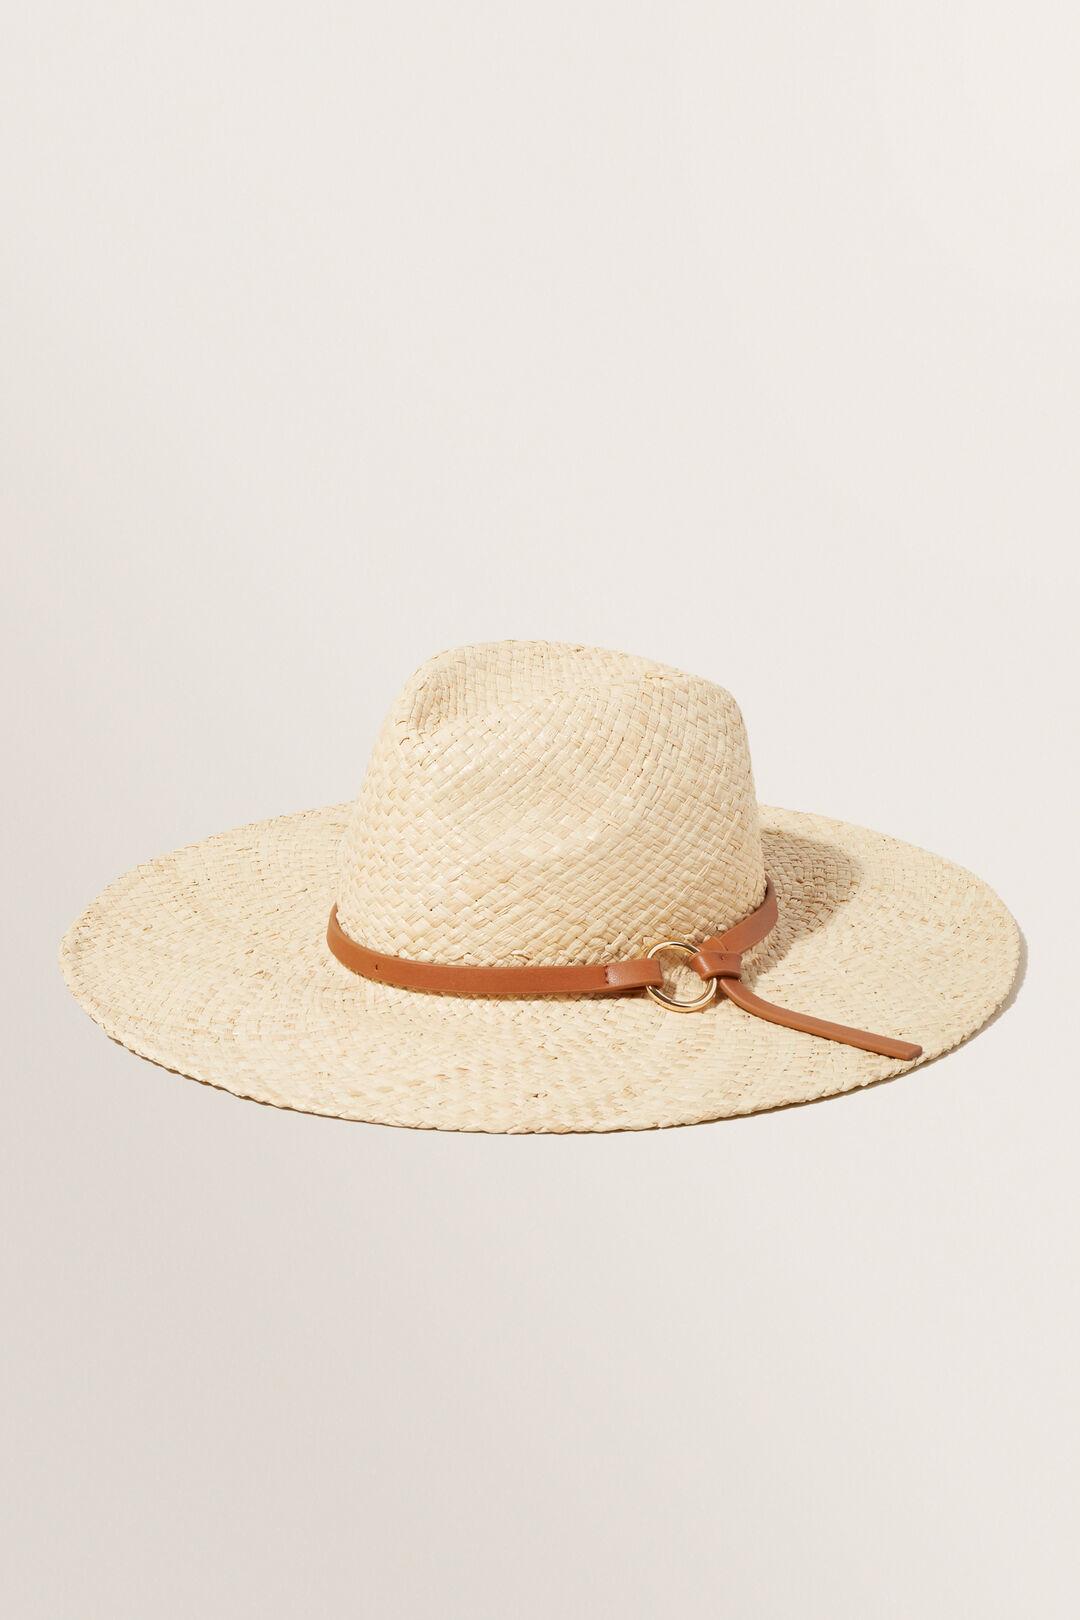 Shelby Panama Hat  TAN  hi-res